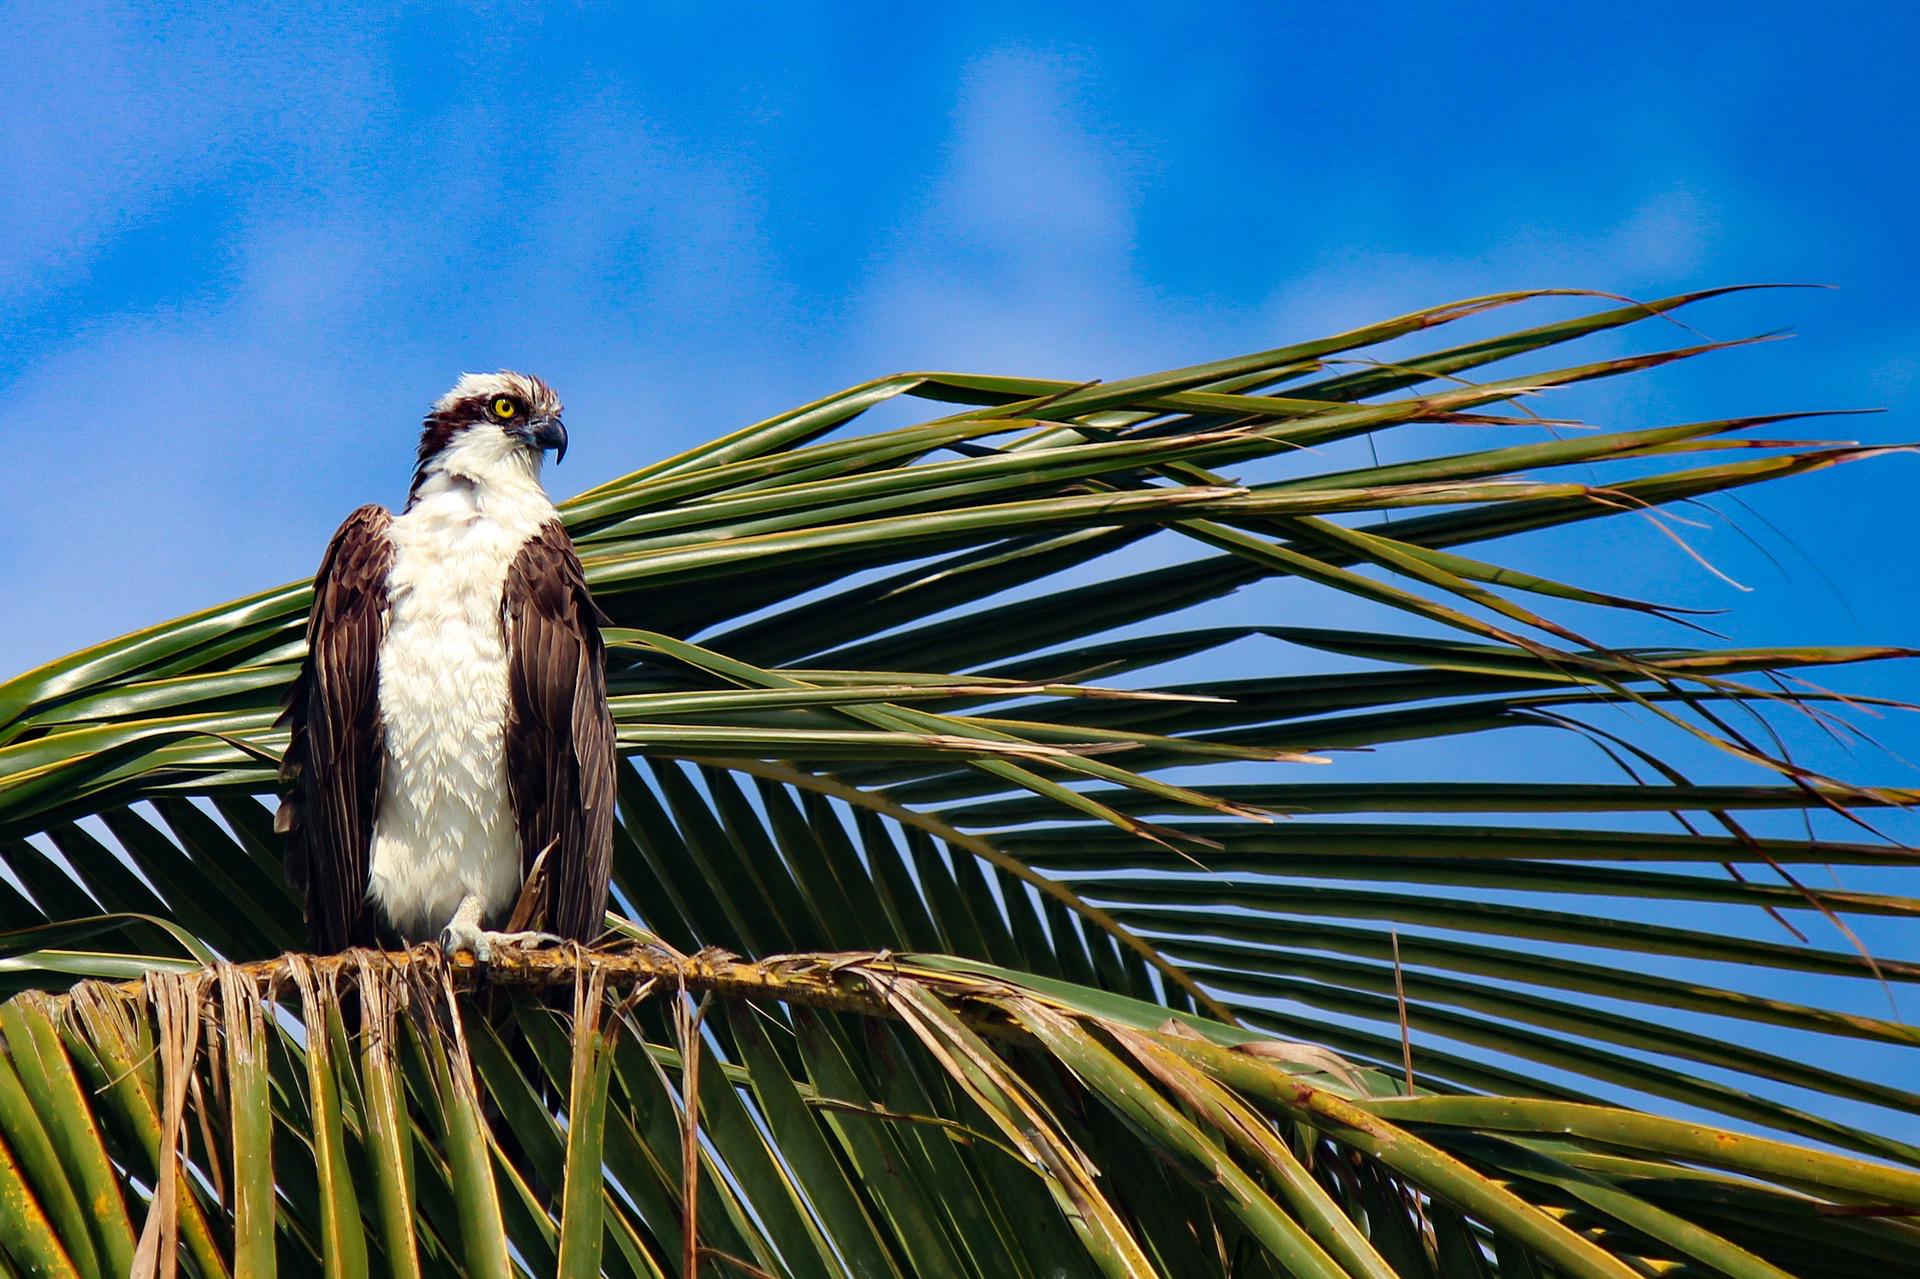 An osprey sitting on a palm tree frond